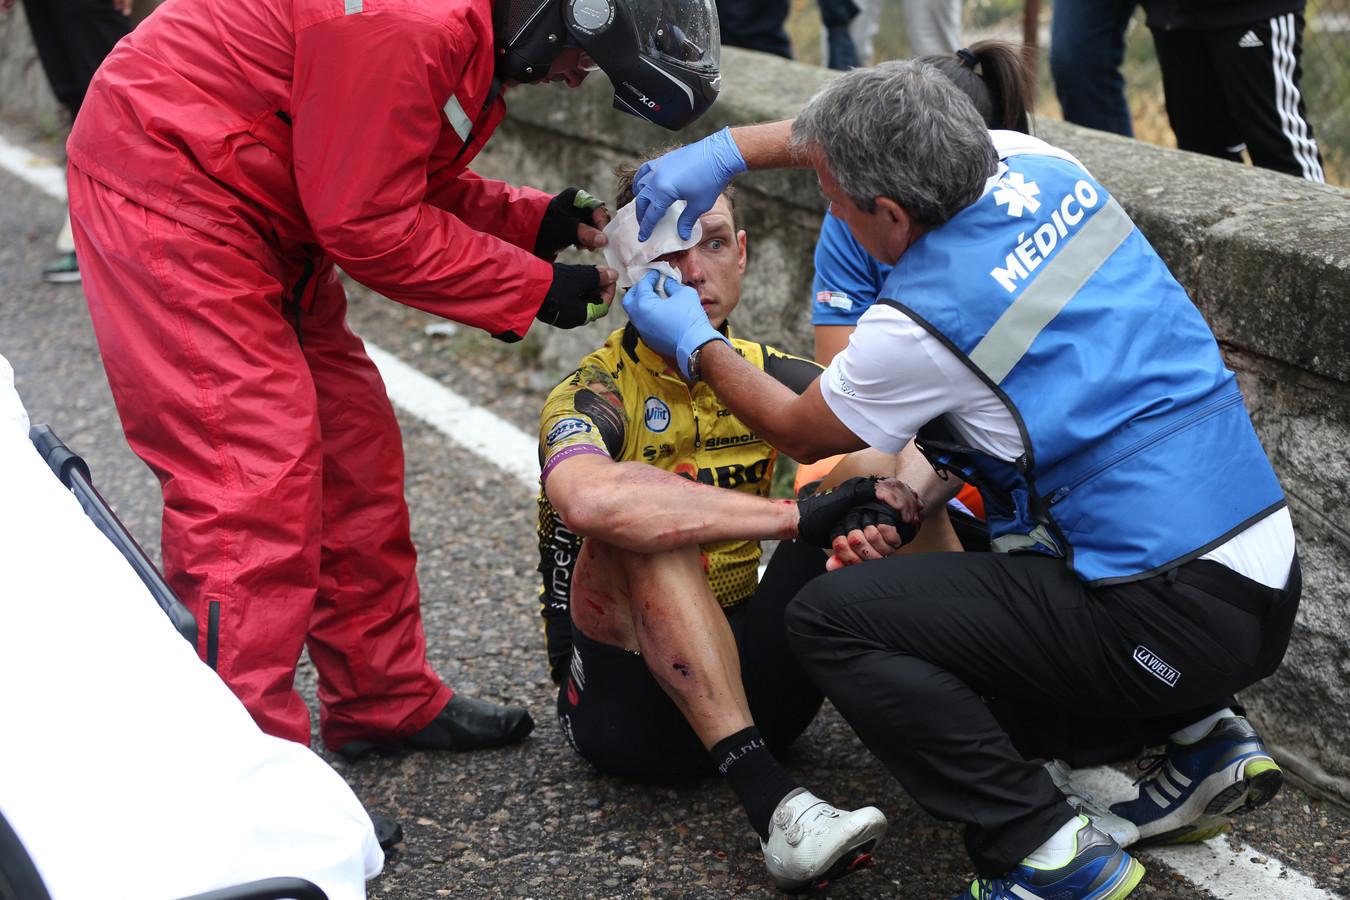 Tony Martin na zijn valpartij in de Vuelta.